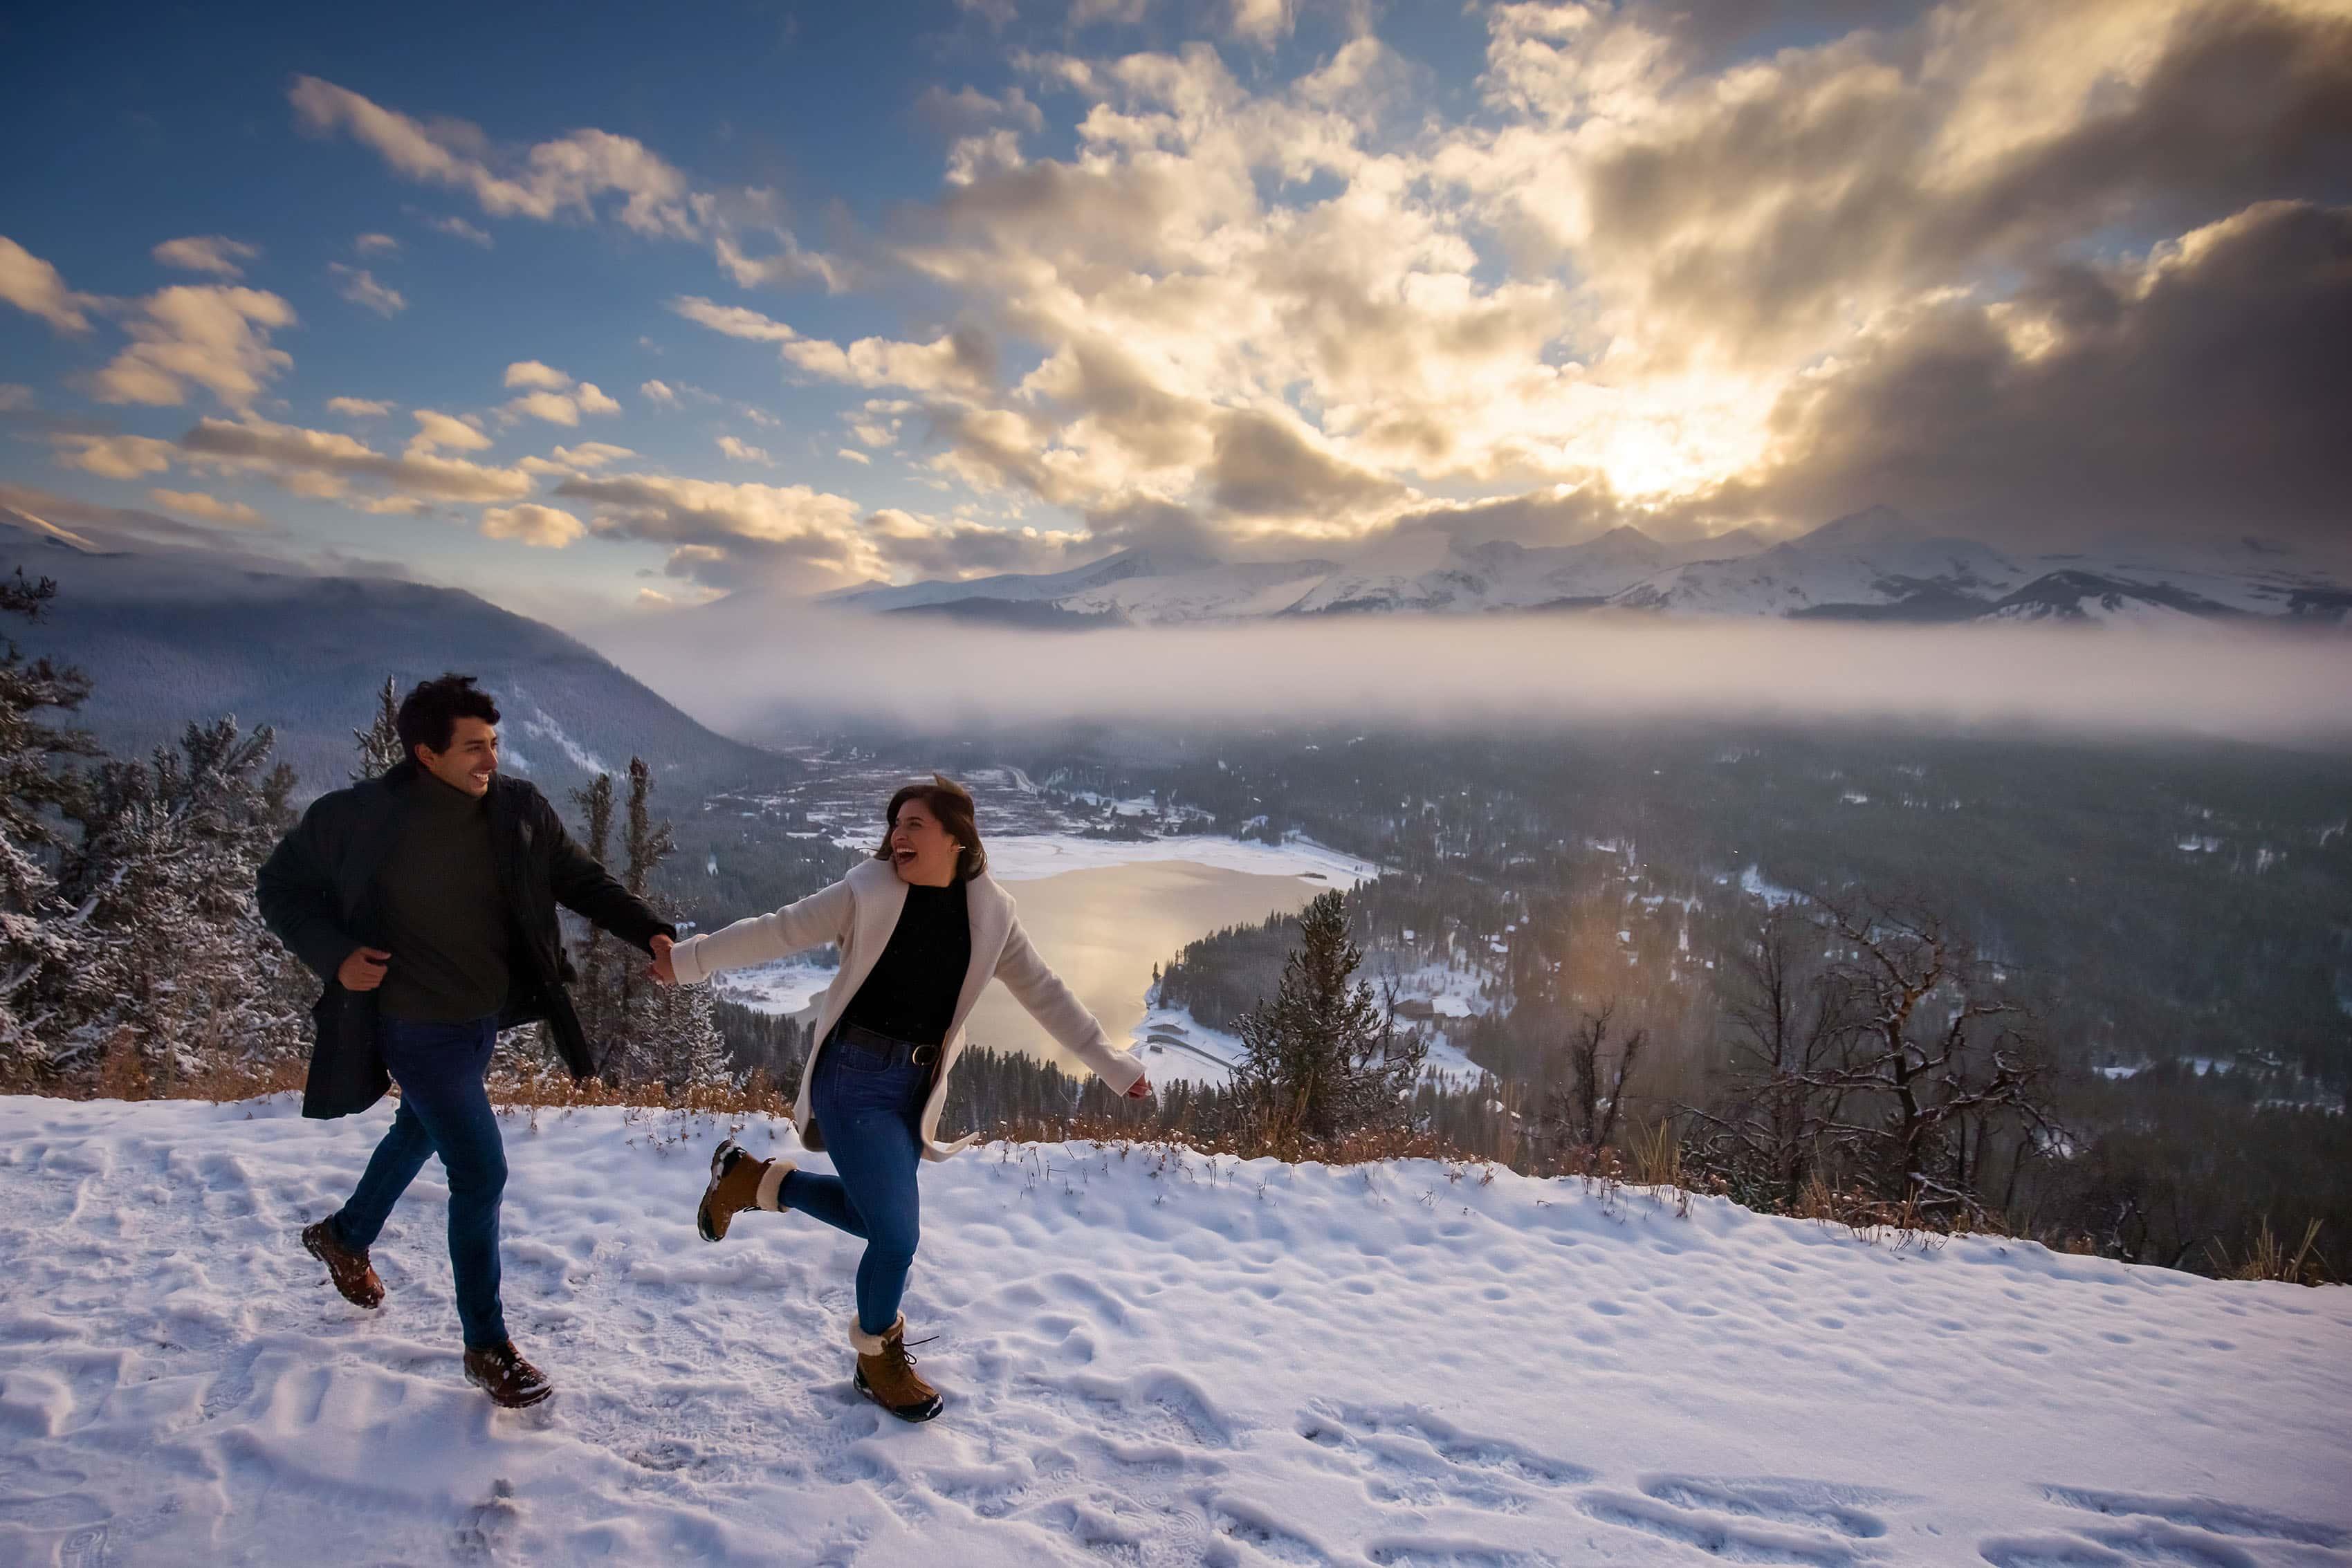 A couple runs along Boreas Pass Road in the snow as the snow sets behind BreckenridgeÕs Ten Mile Range during their engagement photos